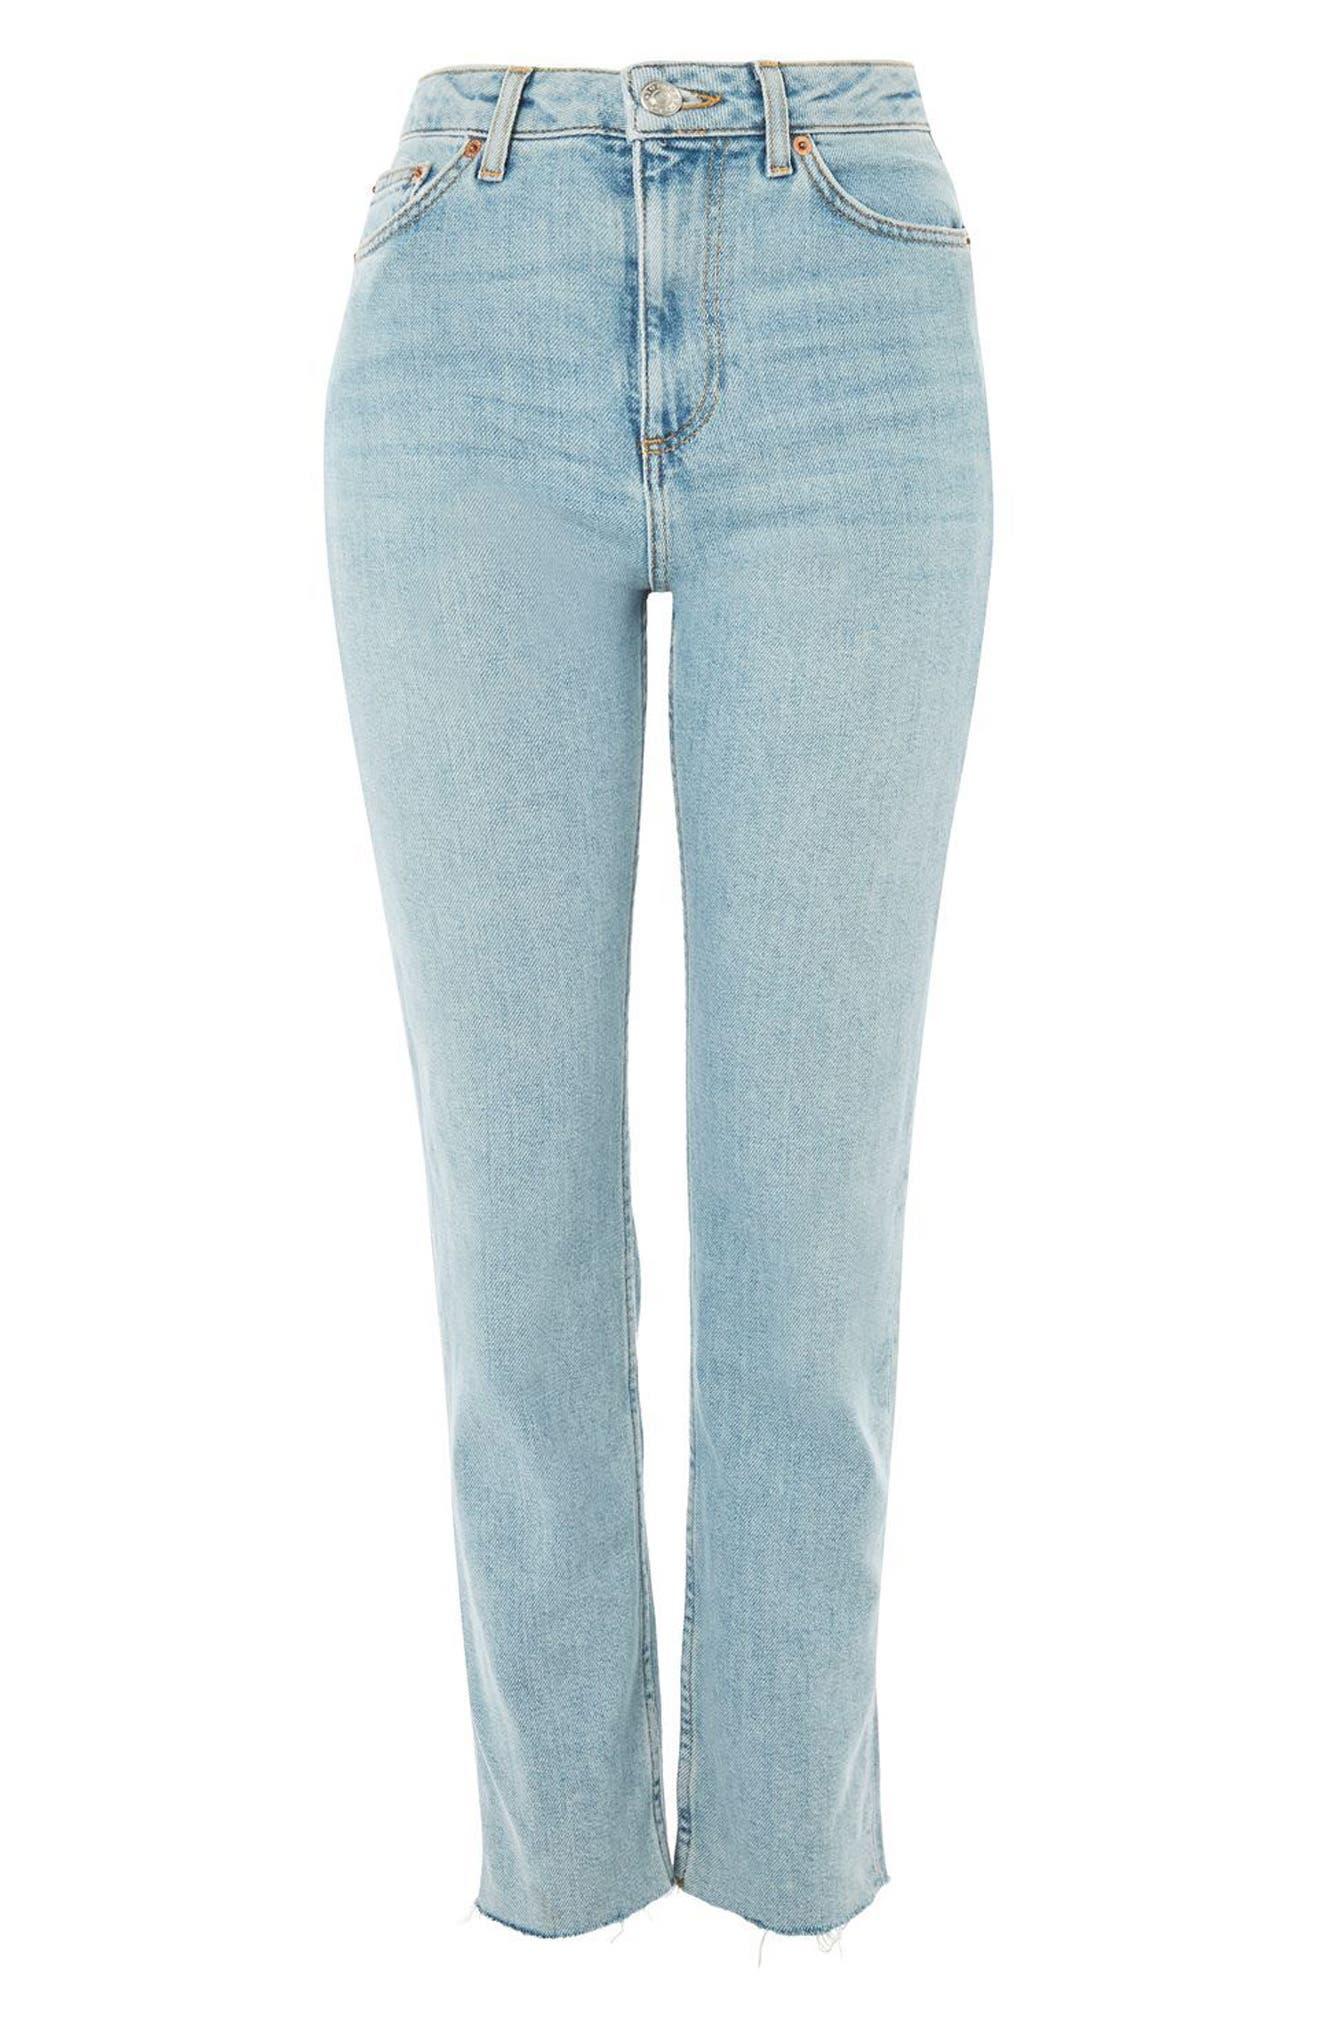 Vintage Bleach Raw Hem Straight Leg Jeans,                             Alternate thumbnail 3, color,                             420